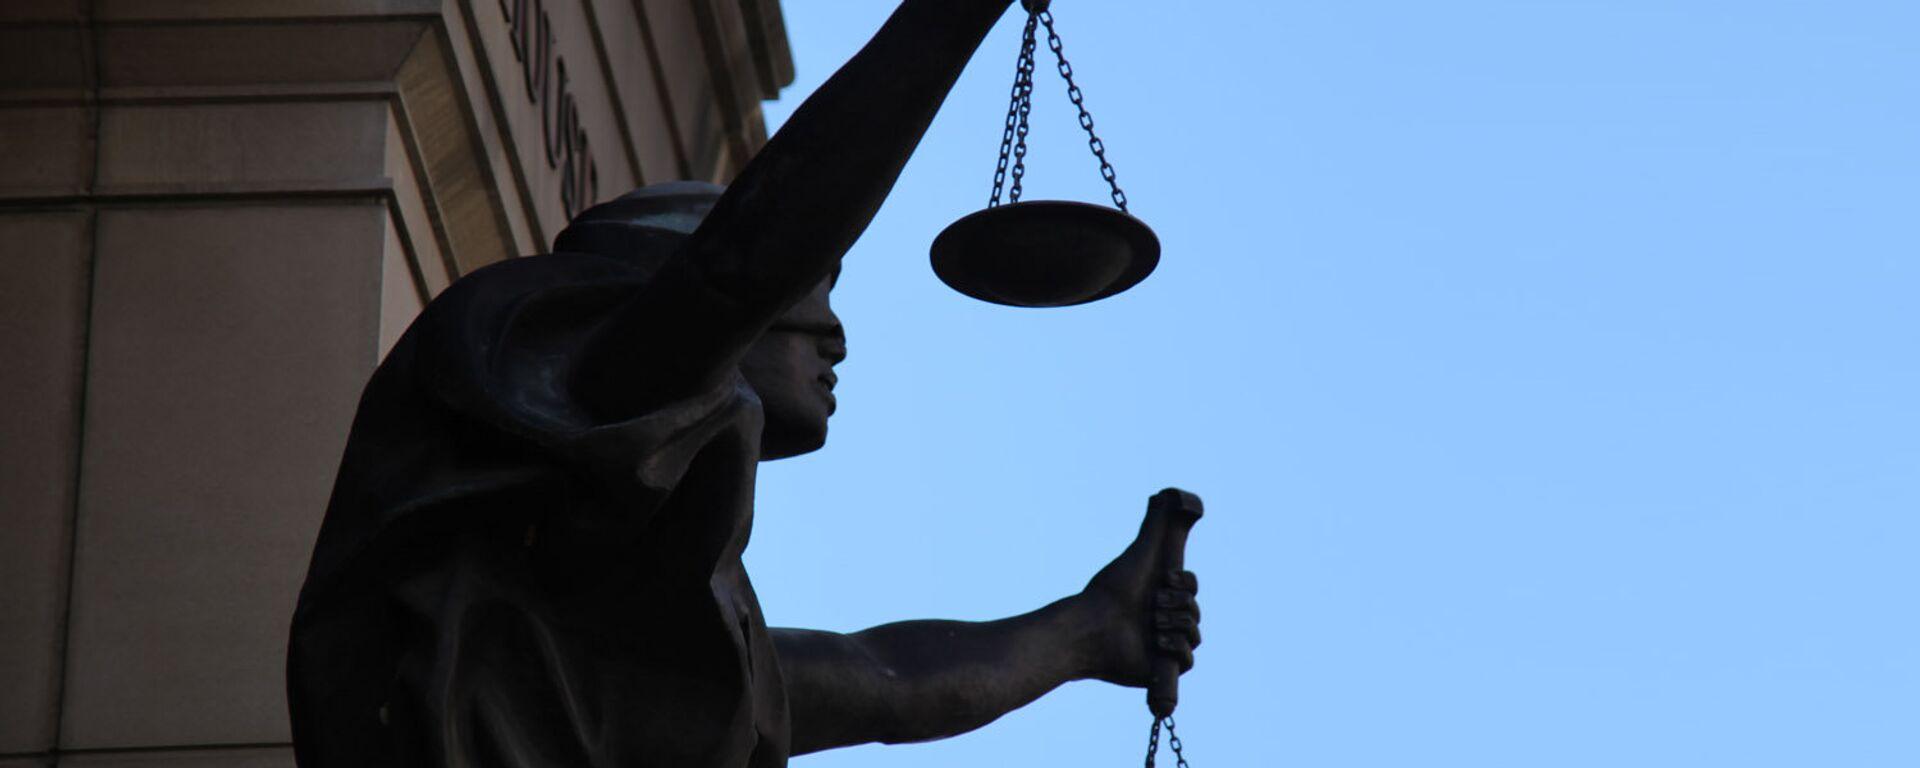 Una estatua de Justicia (imagen referencial) - Sputnik Mundo, 1920, 14.09.2021